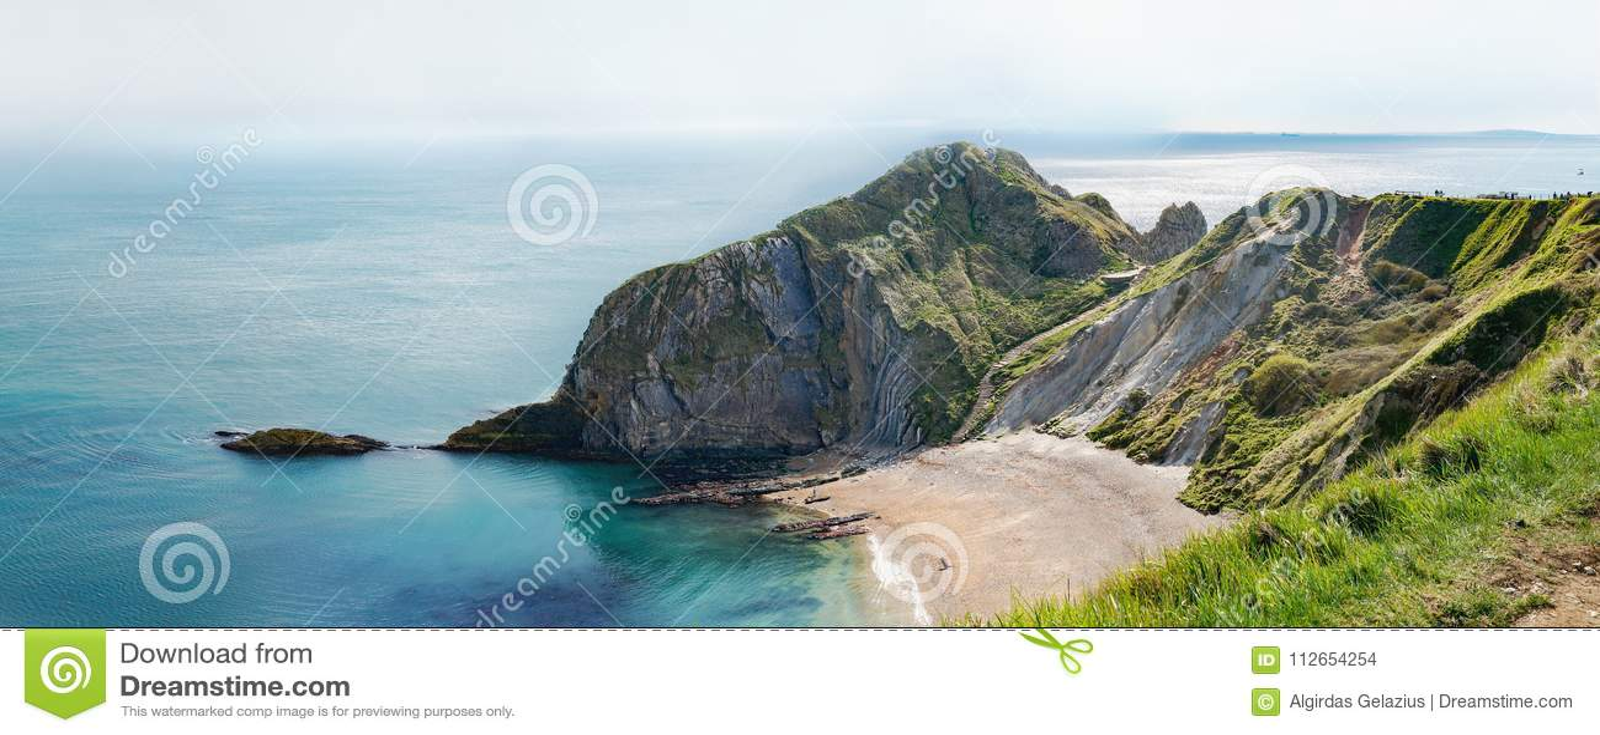 Man of War Bay encloses Man O`War Cove on the Dorset coast